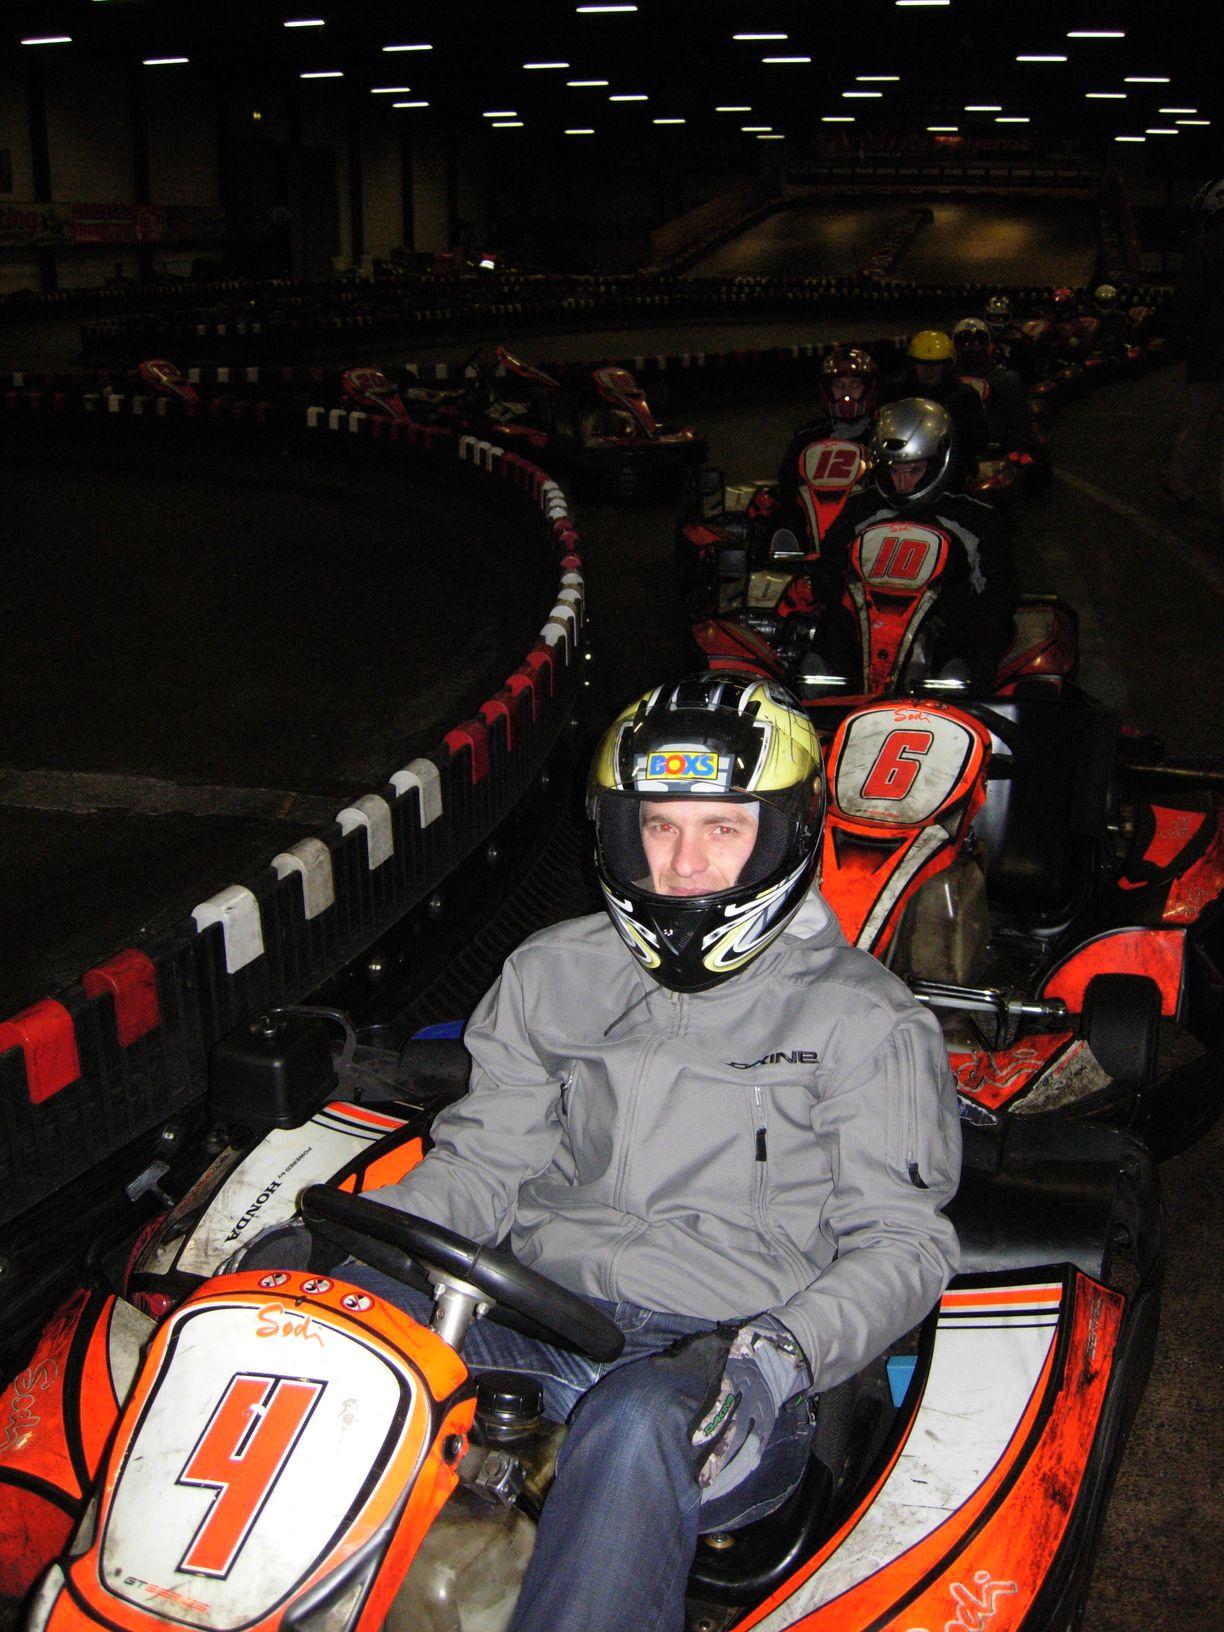 20141206_Karting-003.JPG